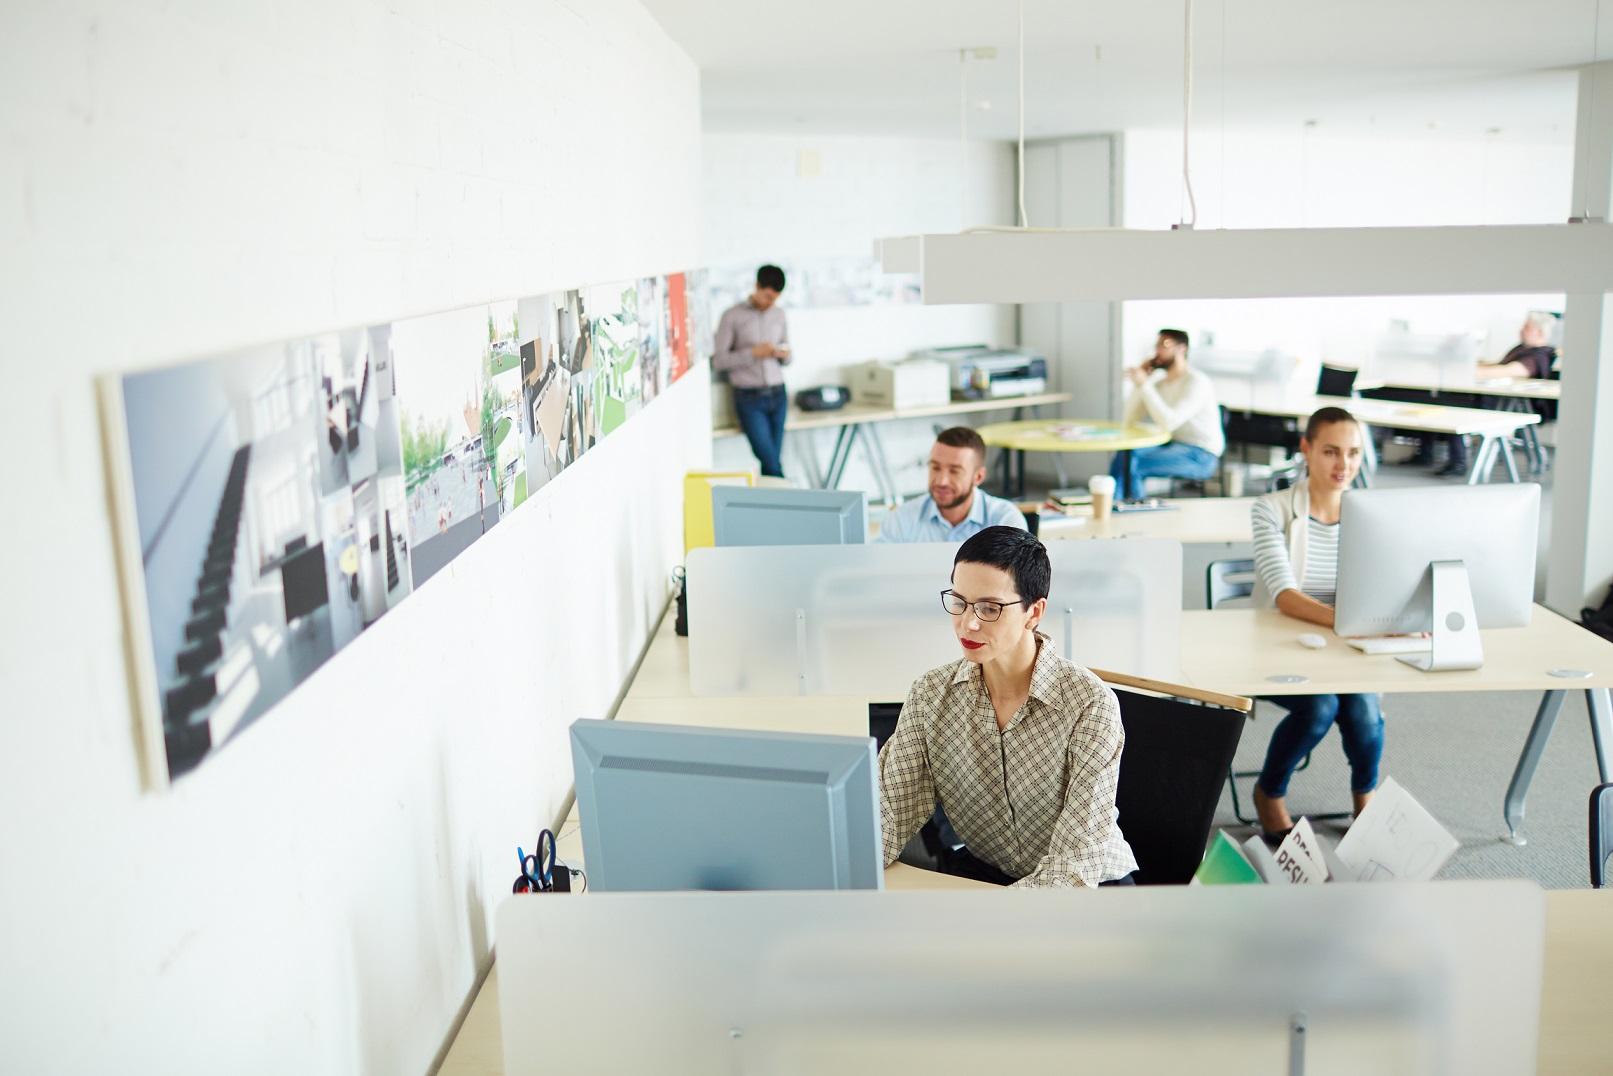 Biuro coworkingowe - wady i zalety